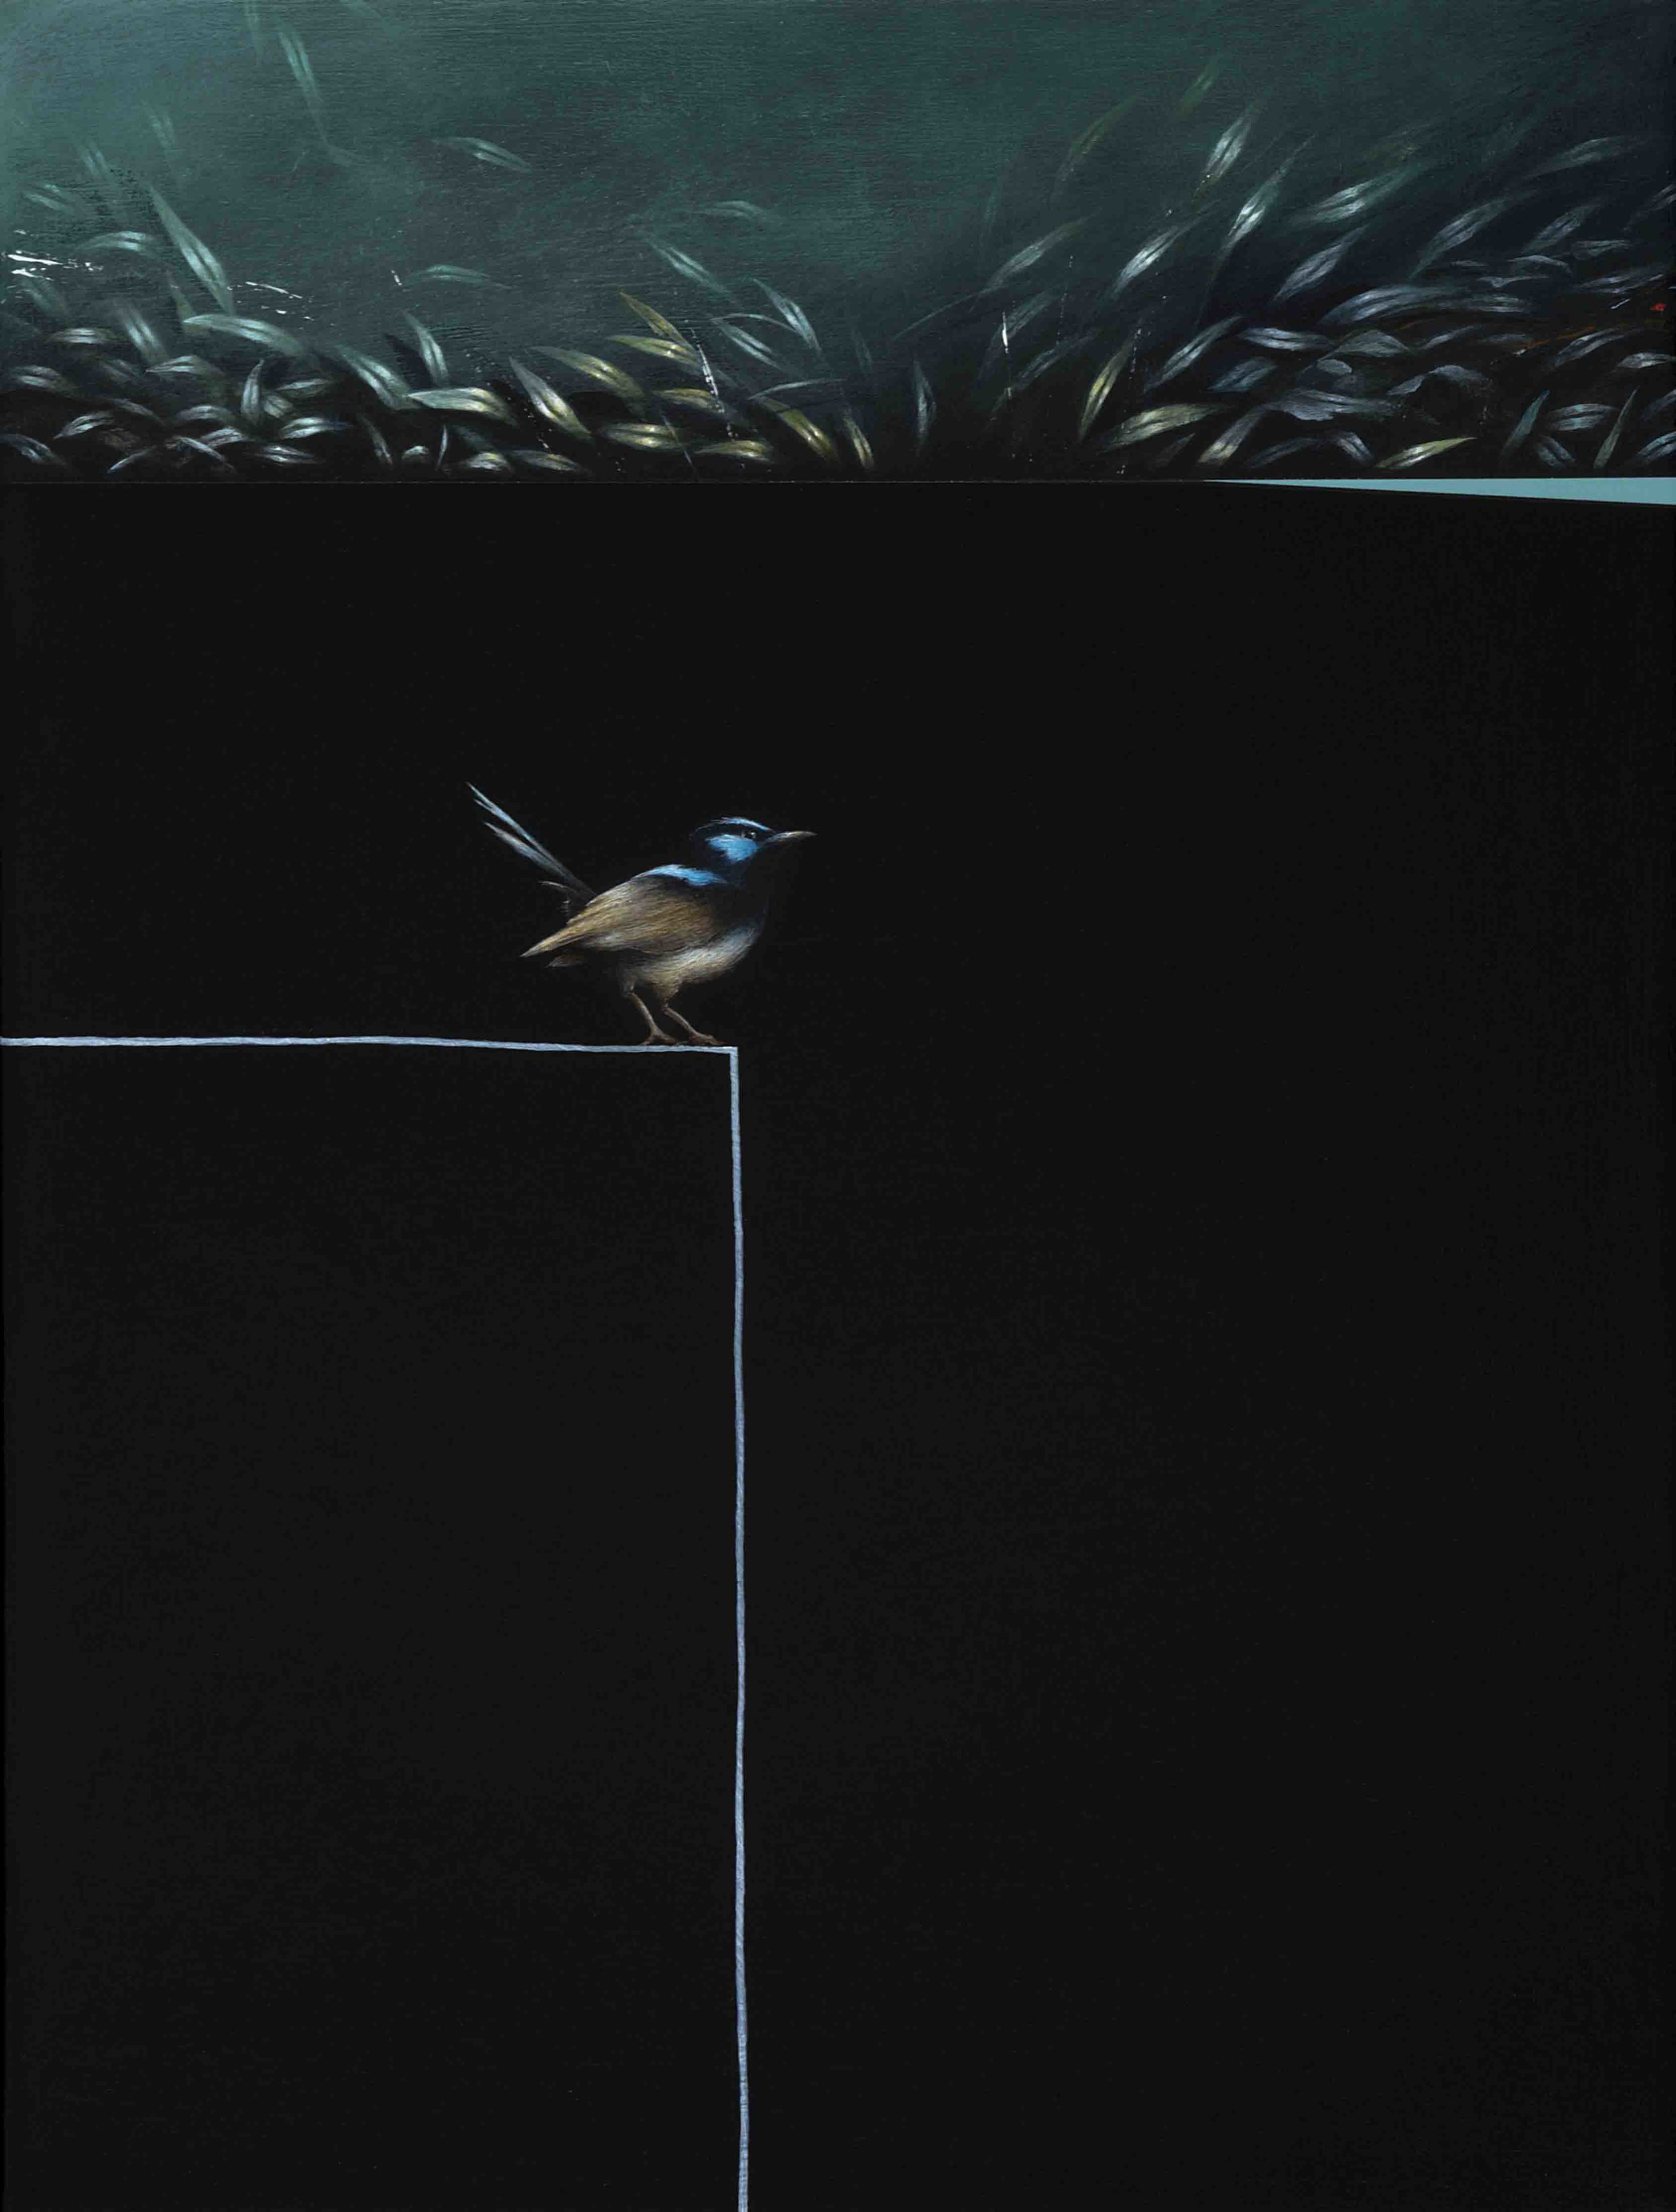 Jarek Wojcik, Enclosure 1,  2016, acrylic on linen, 41 x 31cm